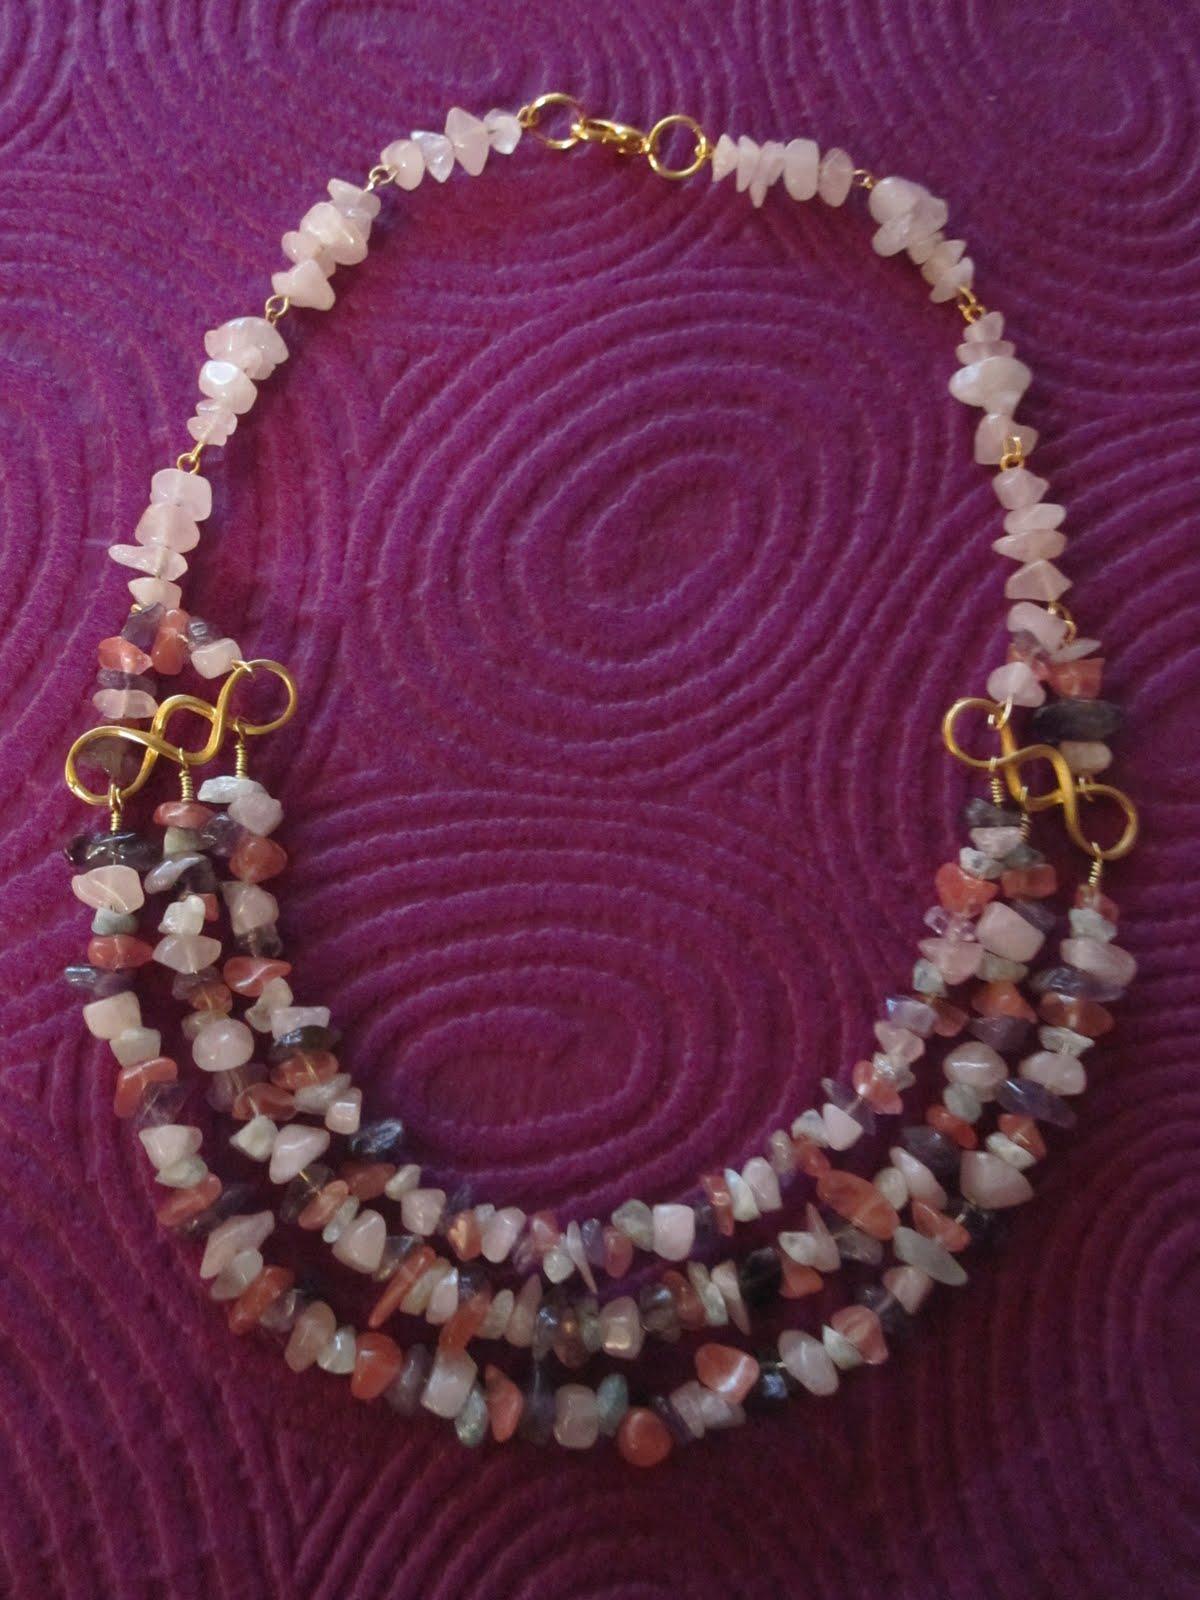 4076d43fa137 Collar corto en dorado con chips de semipreciosas en tonos  rosa claro